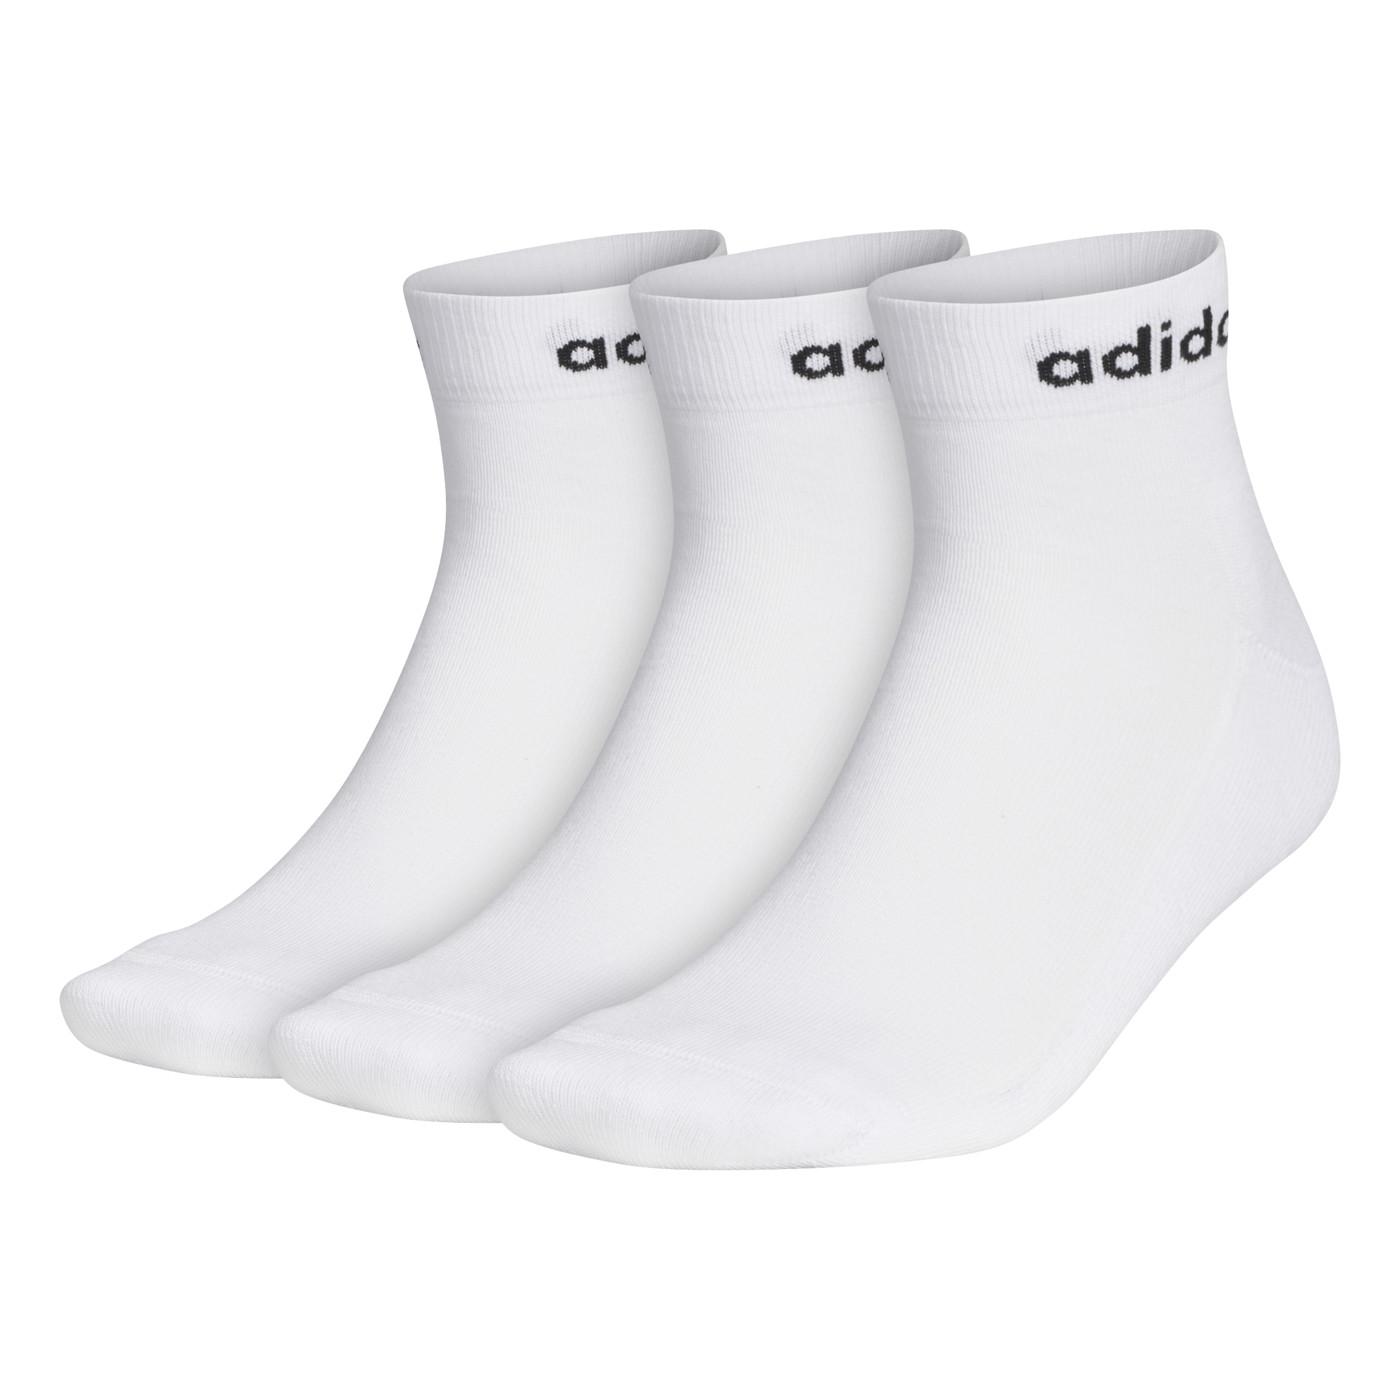 ADIDAS HC ANKLE 3PP - Herren